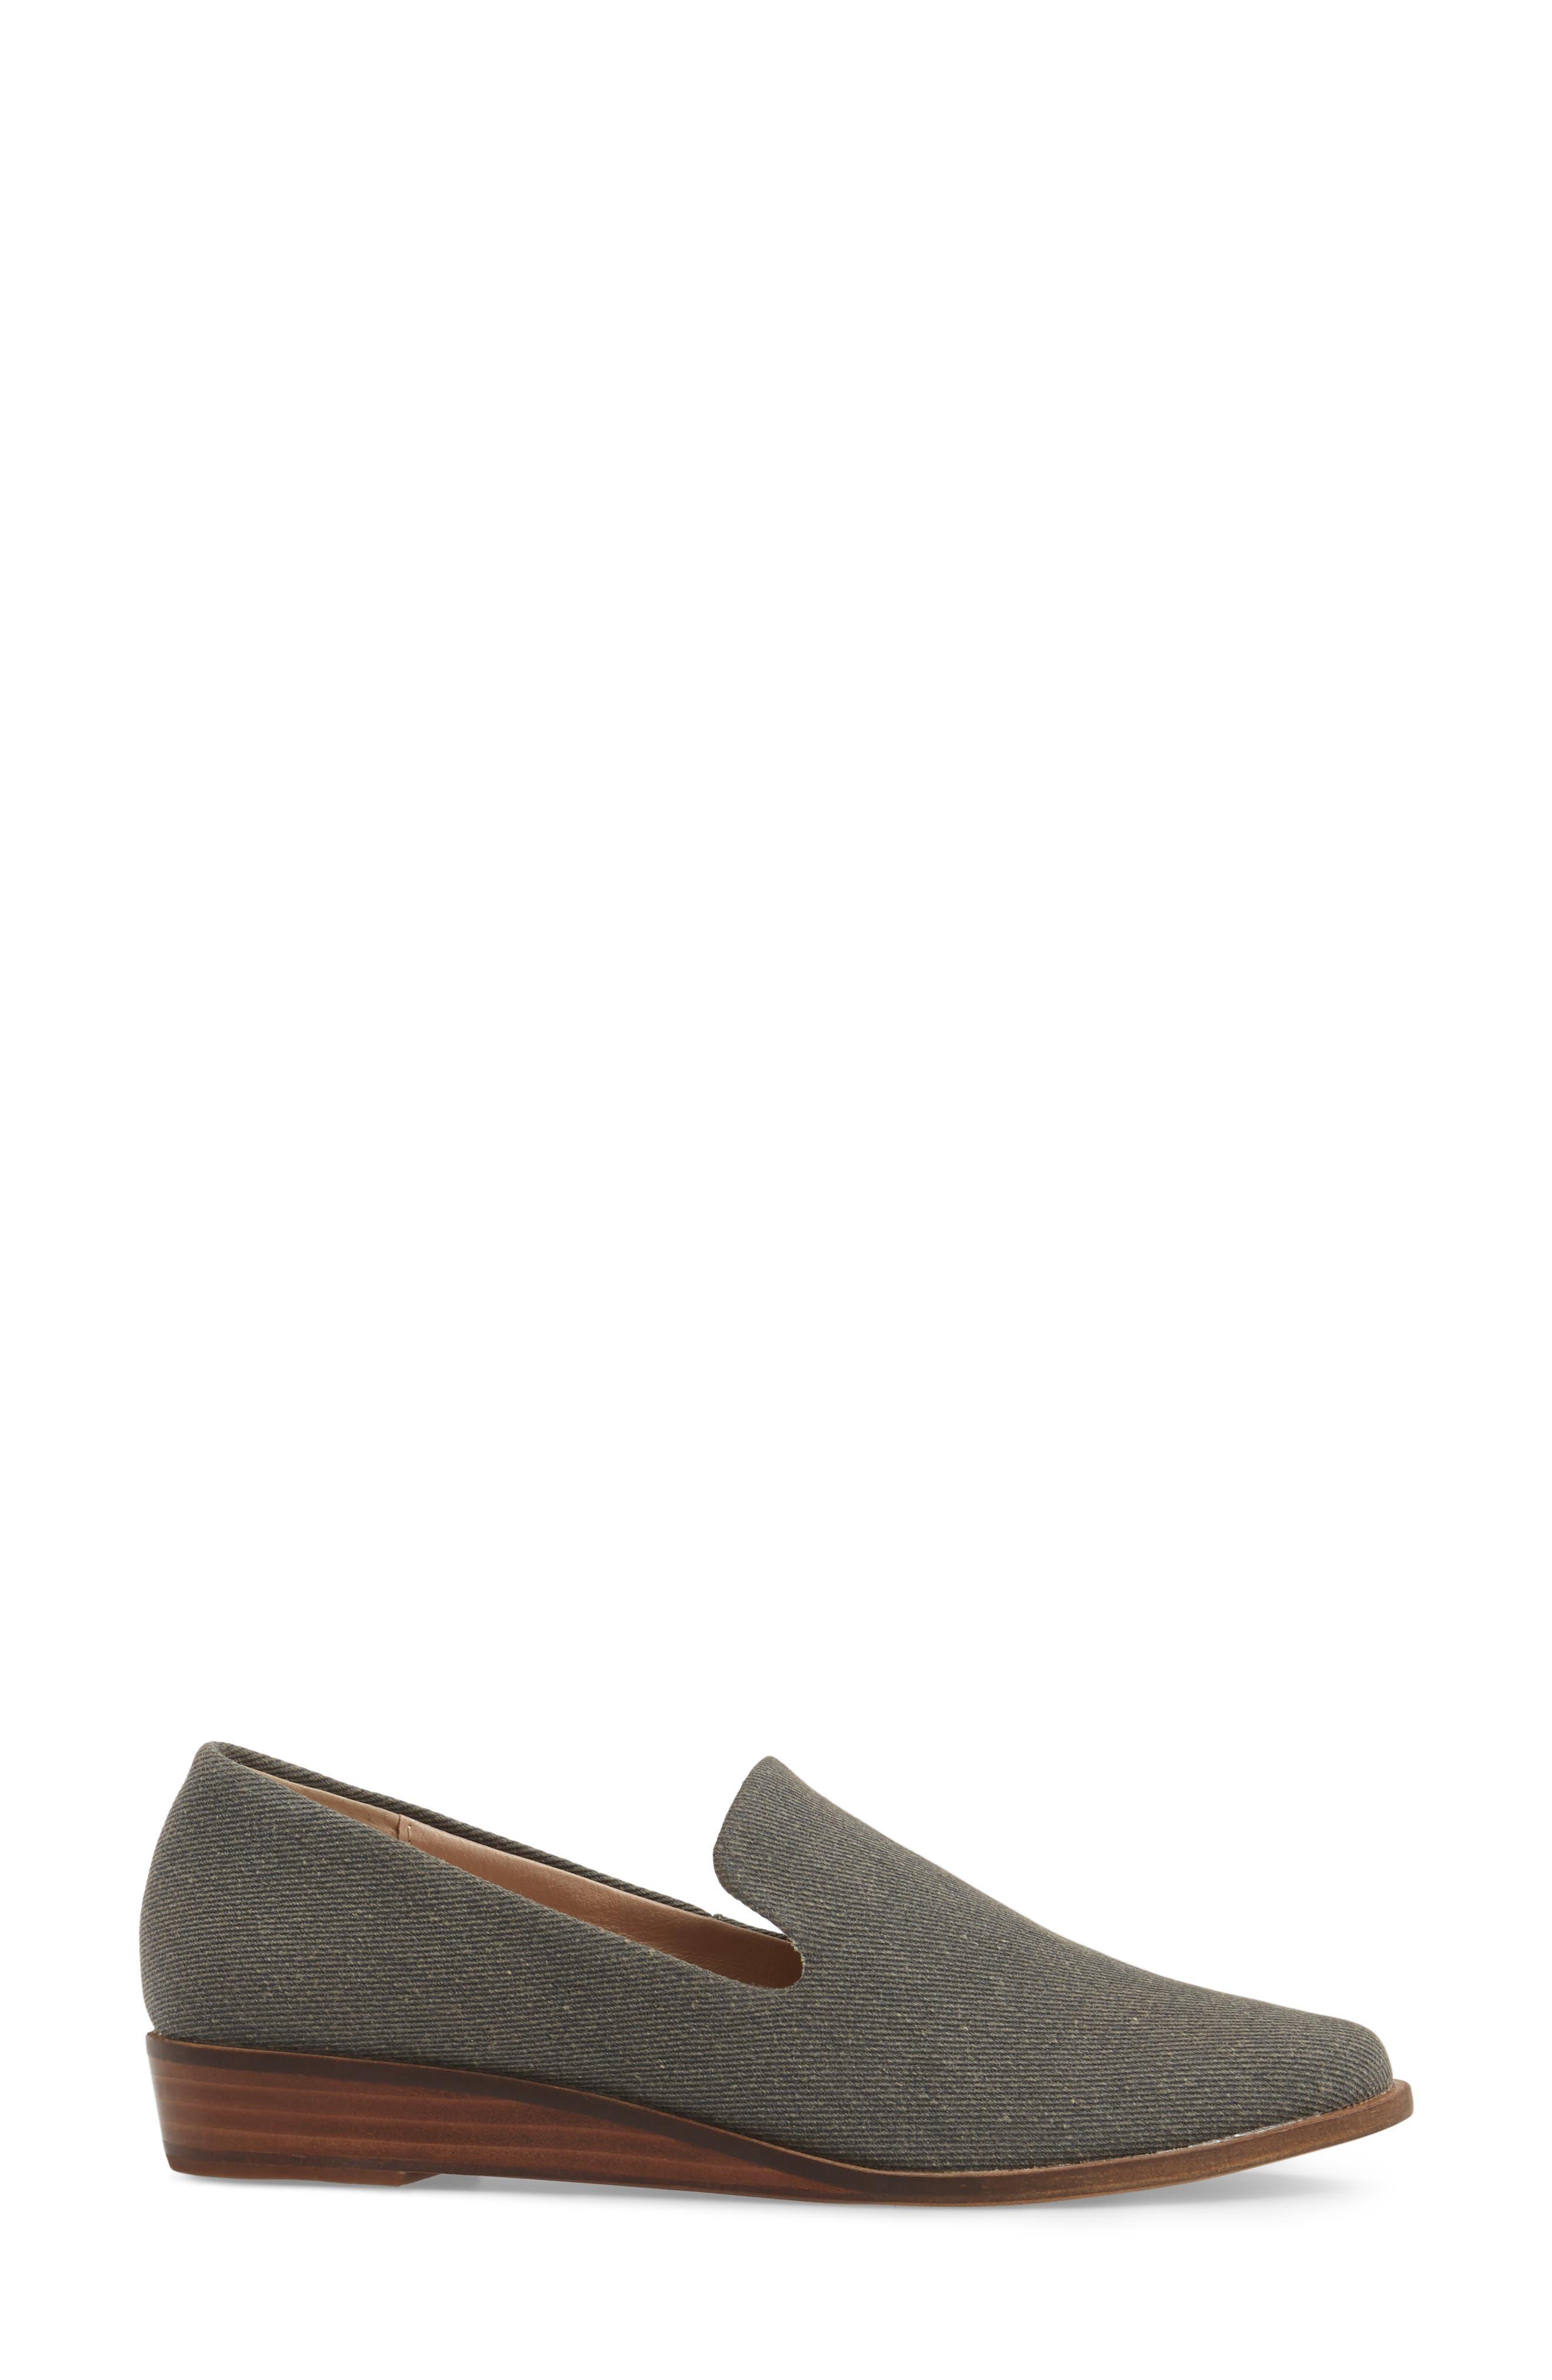 Alternate Image 3  - Kelsi Dagger Brooklyn Abbi Venetian Loafer (Women)